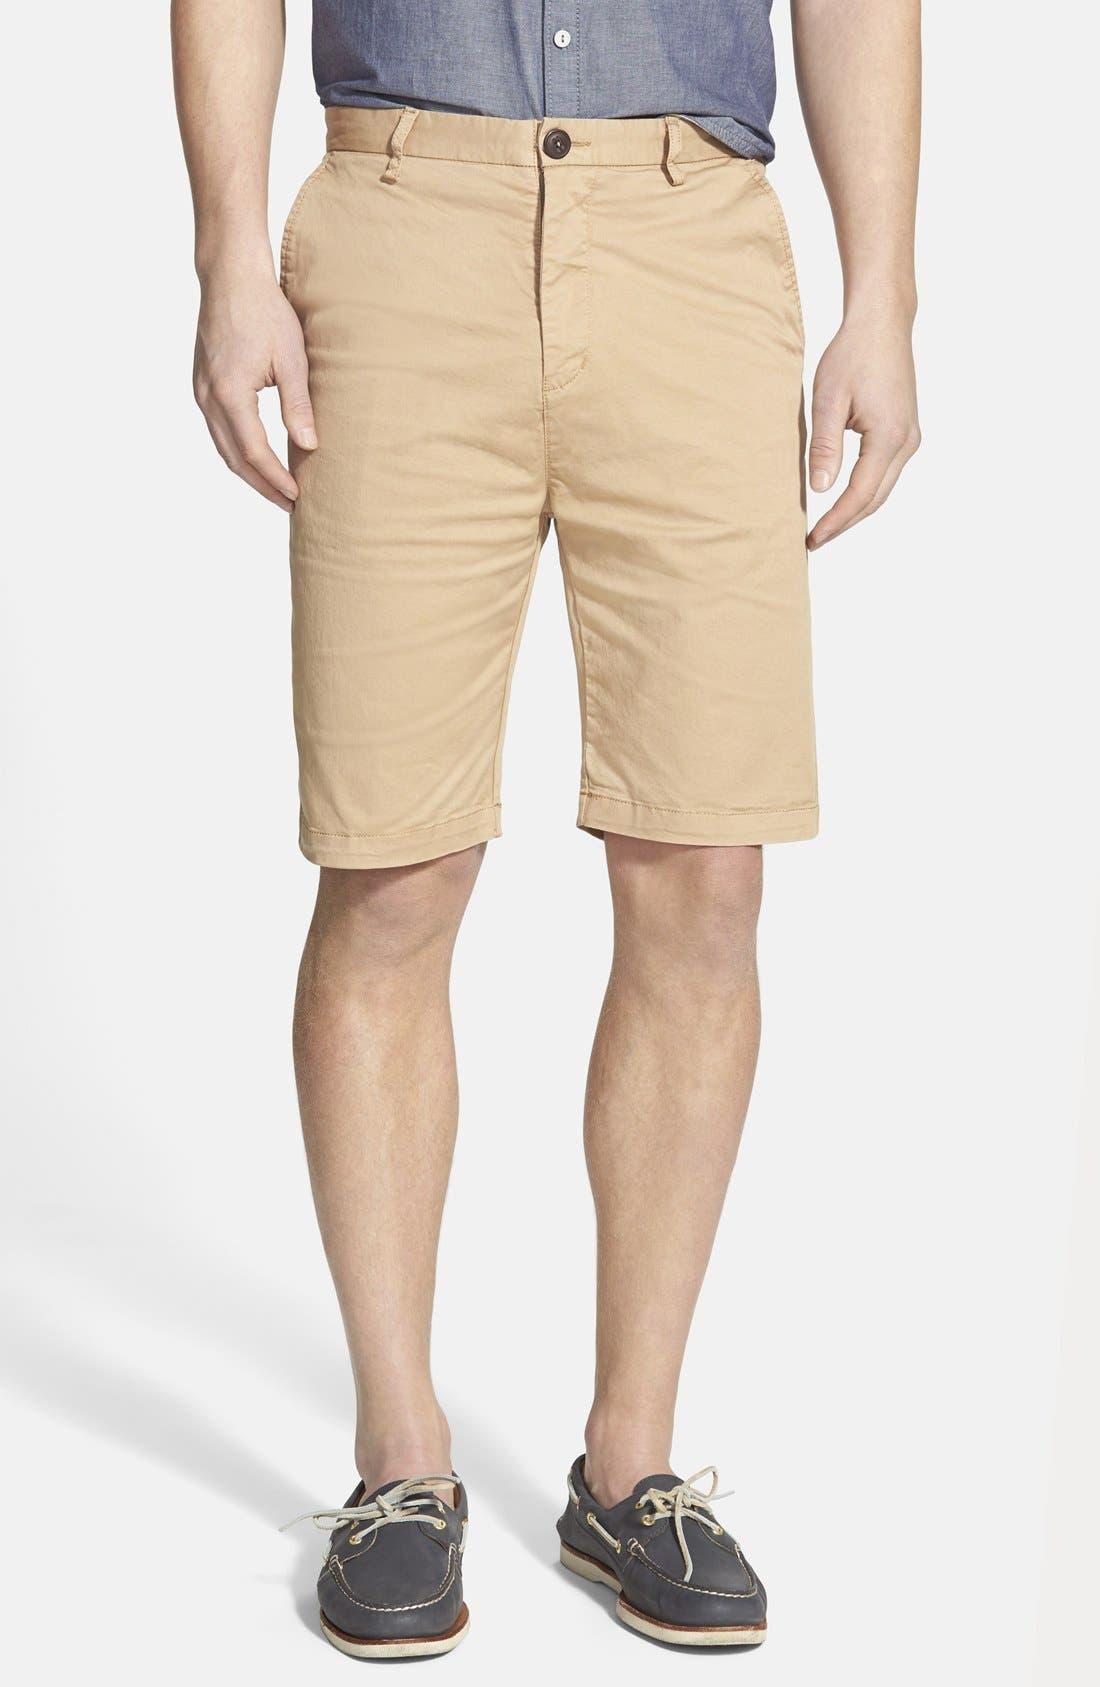 'Penrose' Flat Front Shorts,                             Main thumbnail 1, color,                             Camel